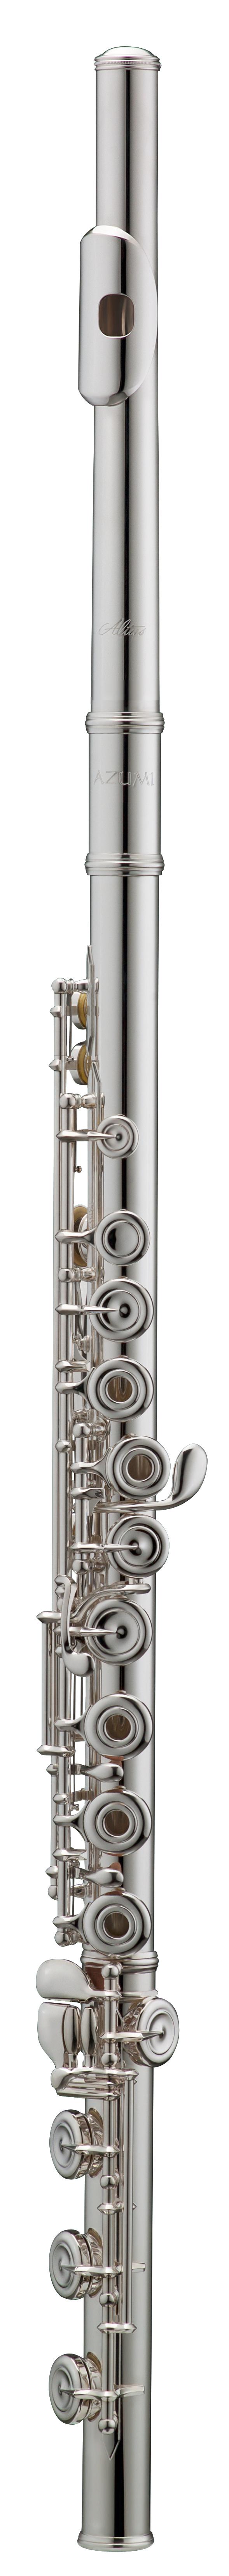 Azumi - AZ - S2 - RBEO - Holzblasinstrumente - Flöten mit E-Mechanik | MUSIK BERTRAM Deutschland Freiburg